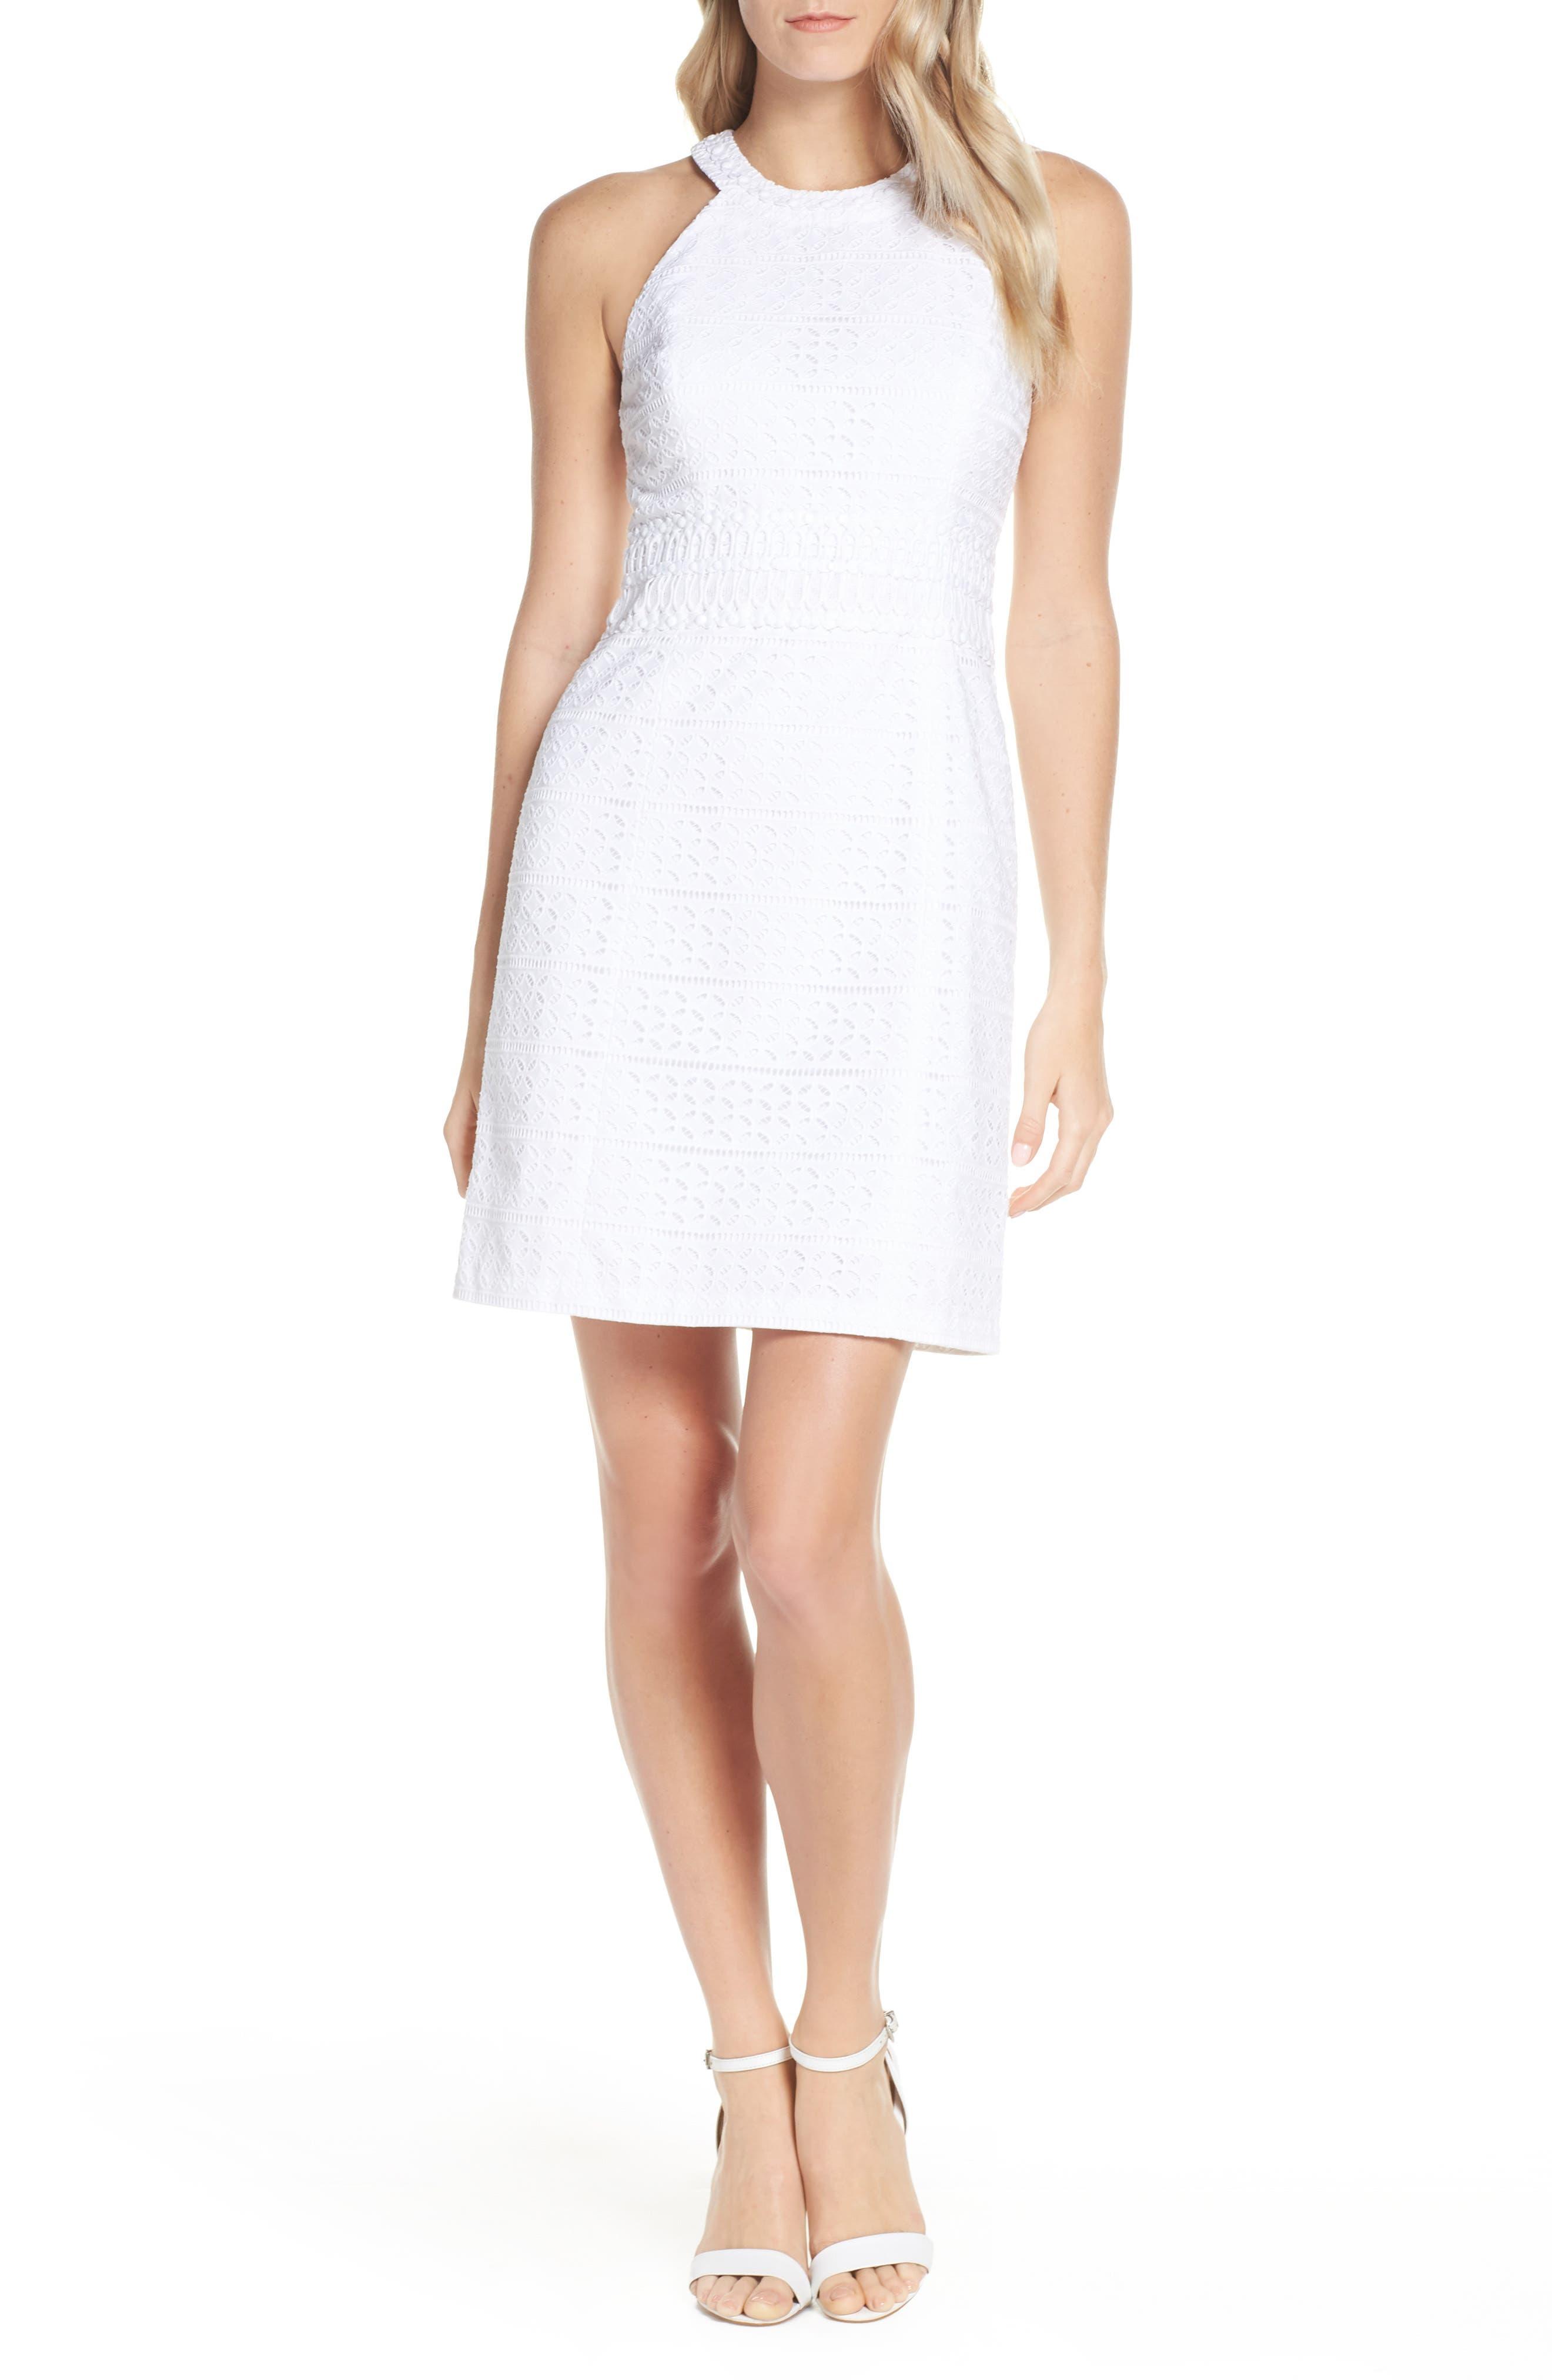 Lilly Pulitzer Ashlyn Lace Shift Dress, White